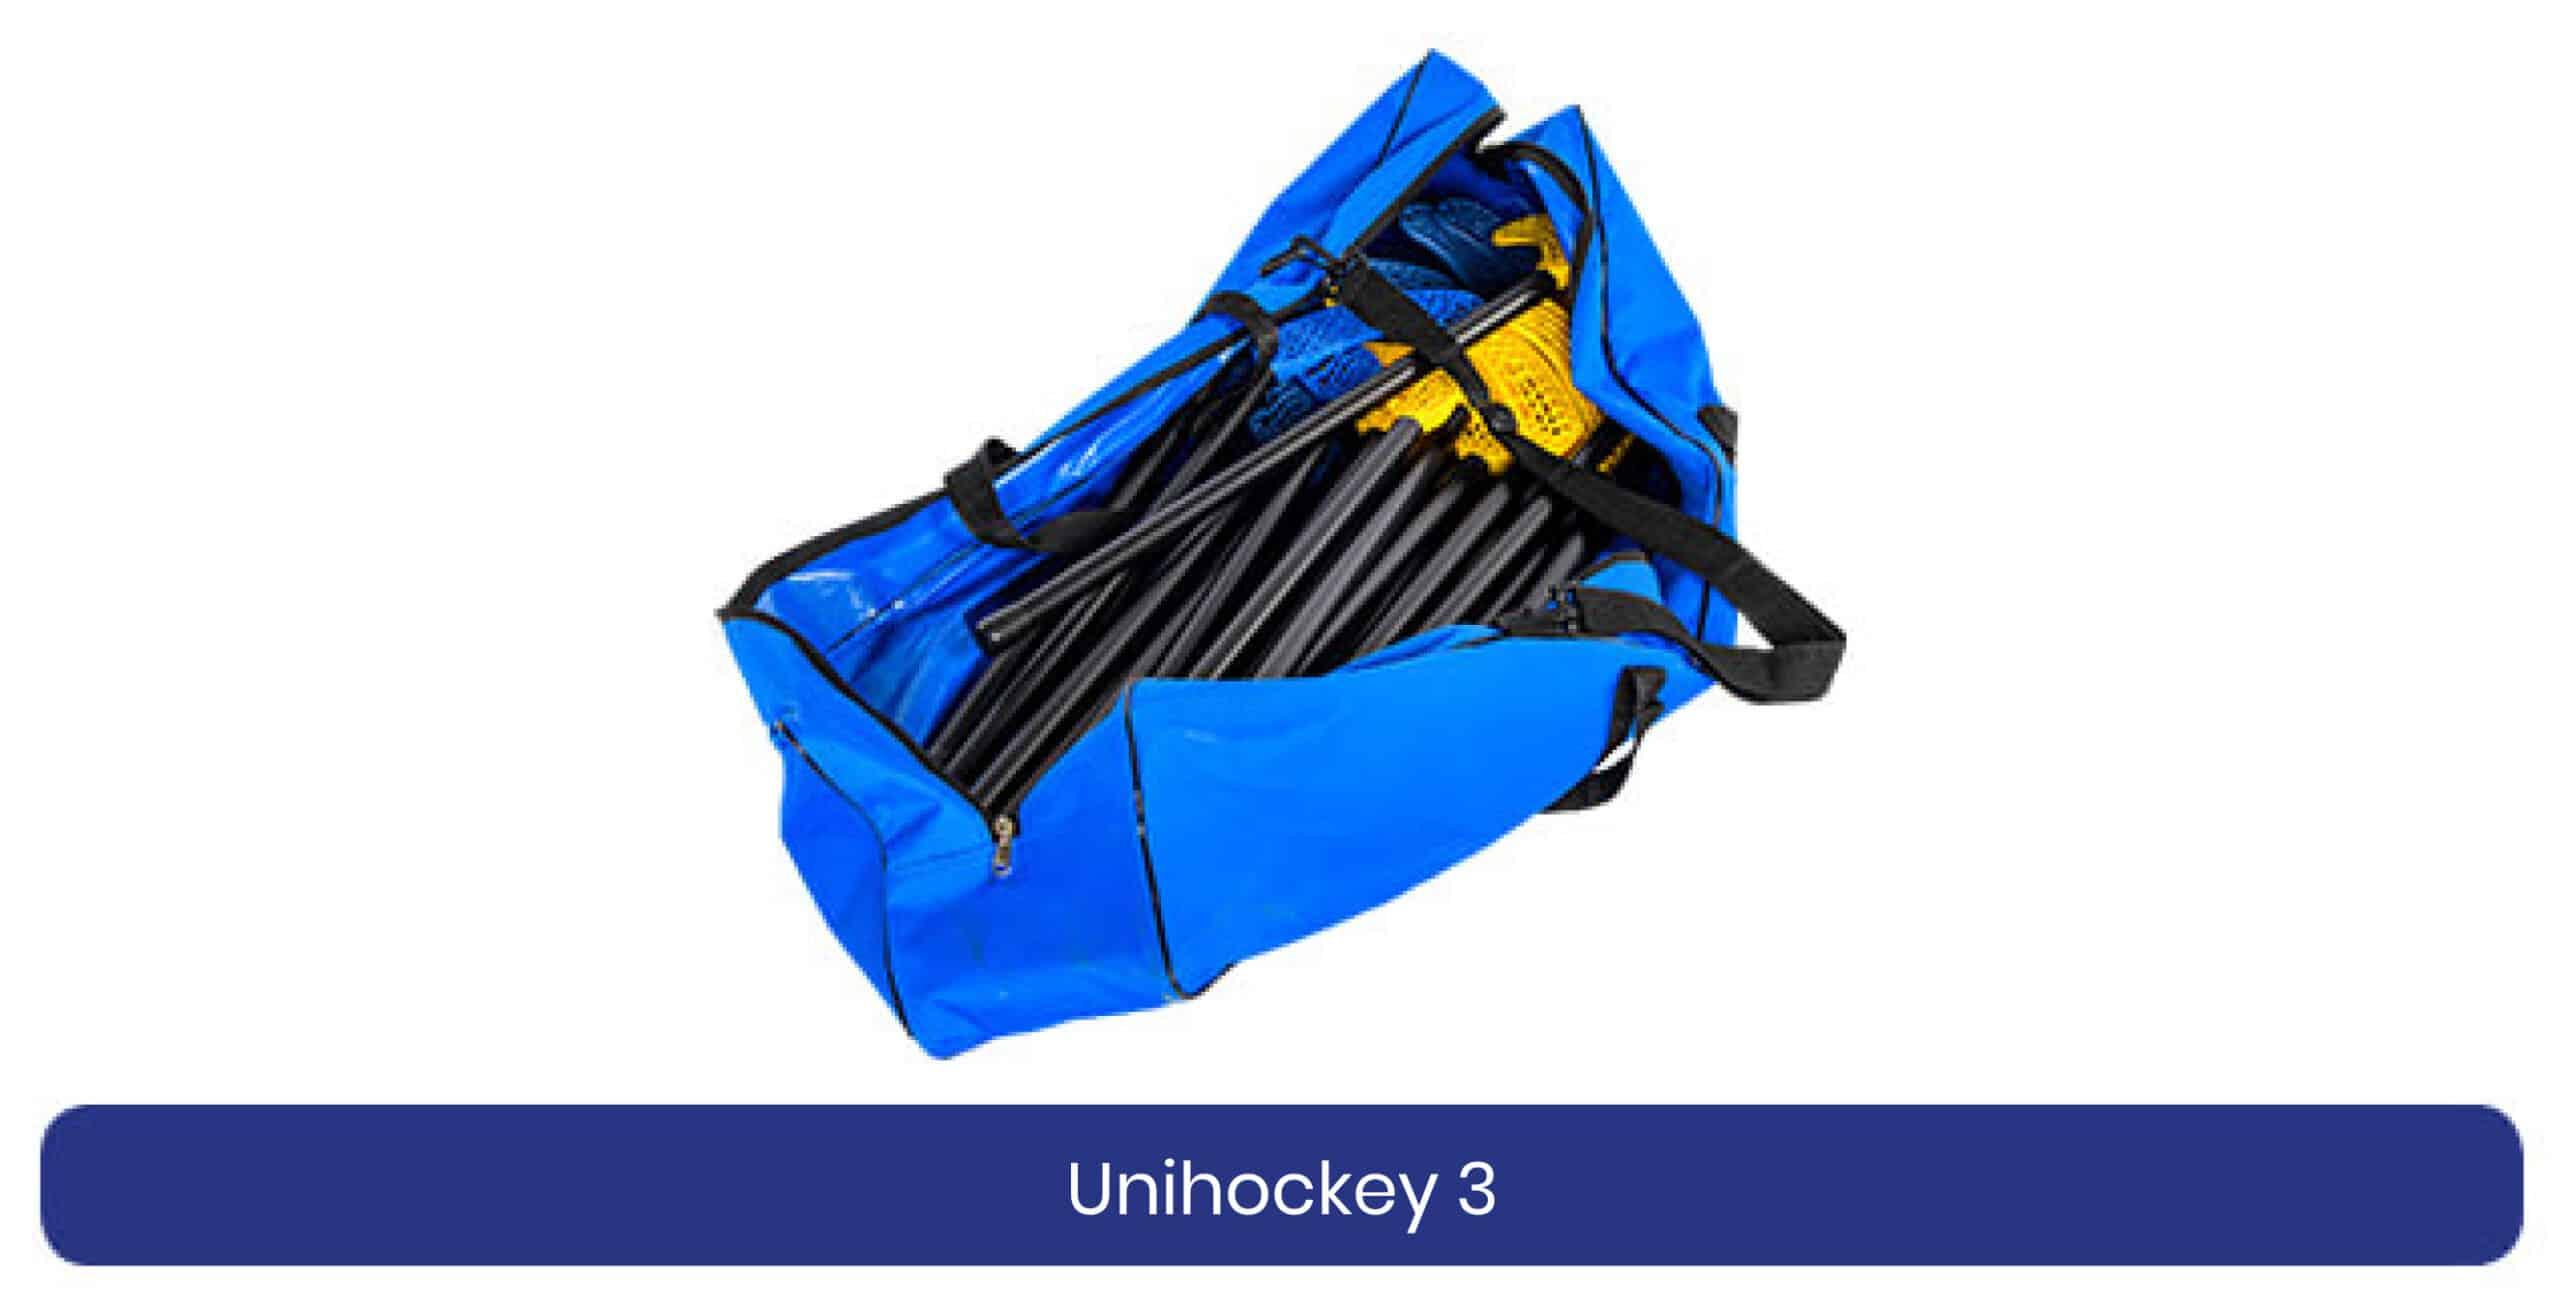 Unihockey 3 lenen product